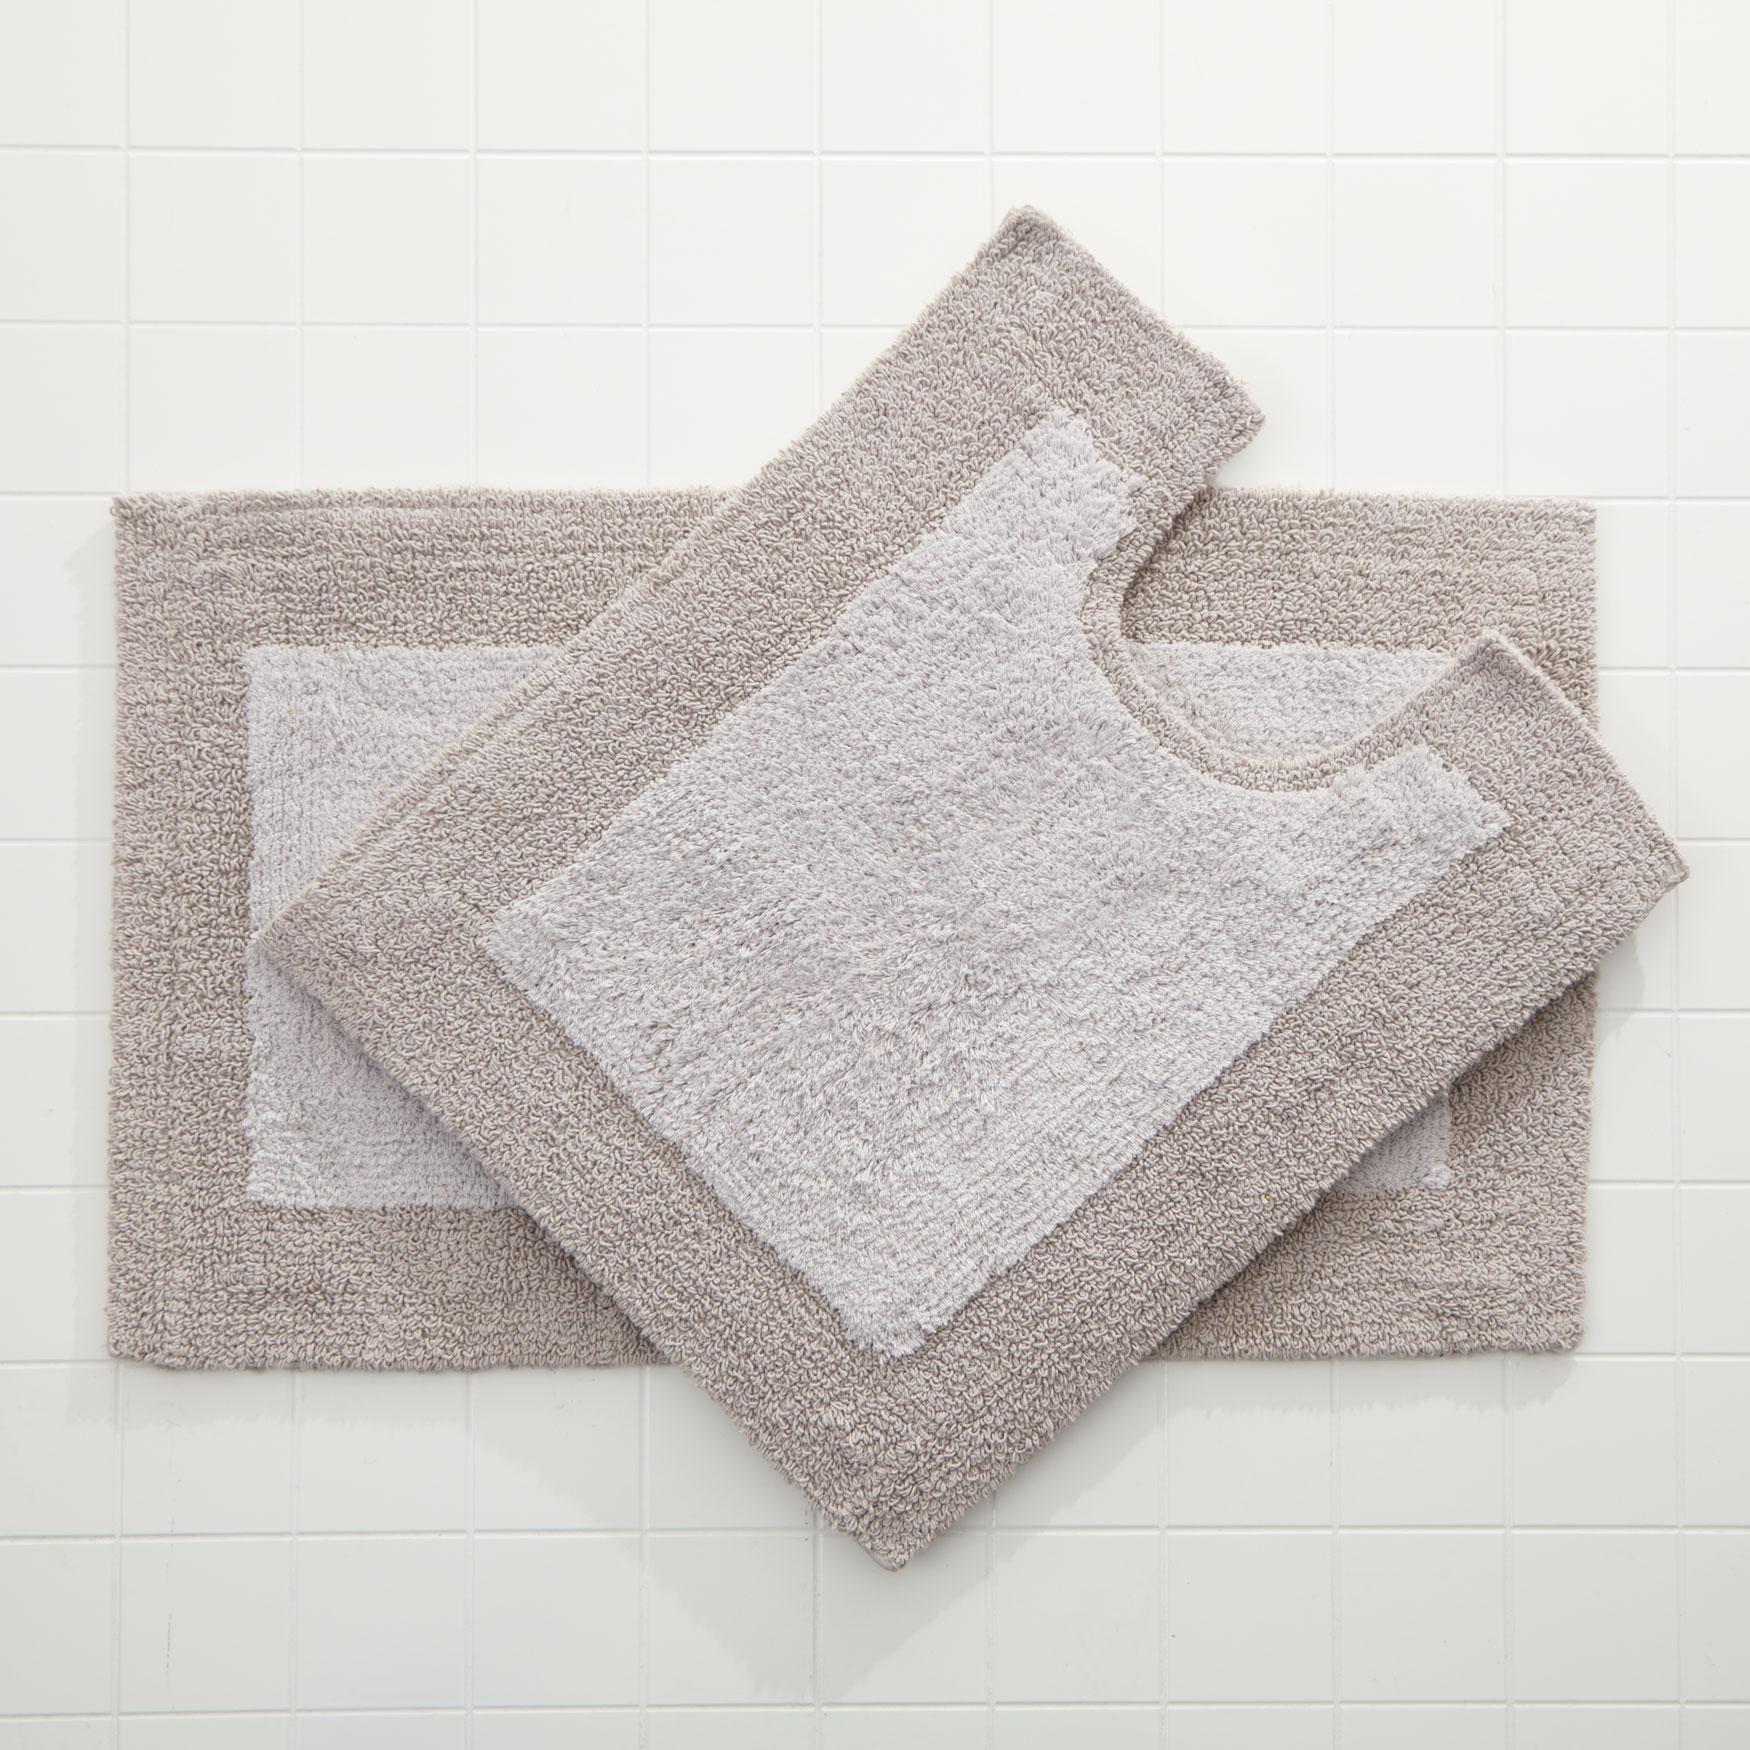 BrylaneHome® Studio 2-Pc. Bath Rug Set, SILVER